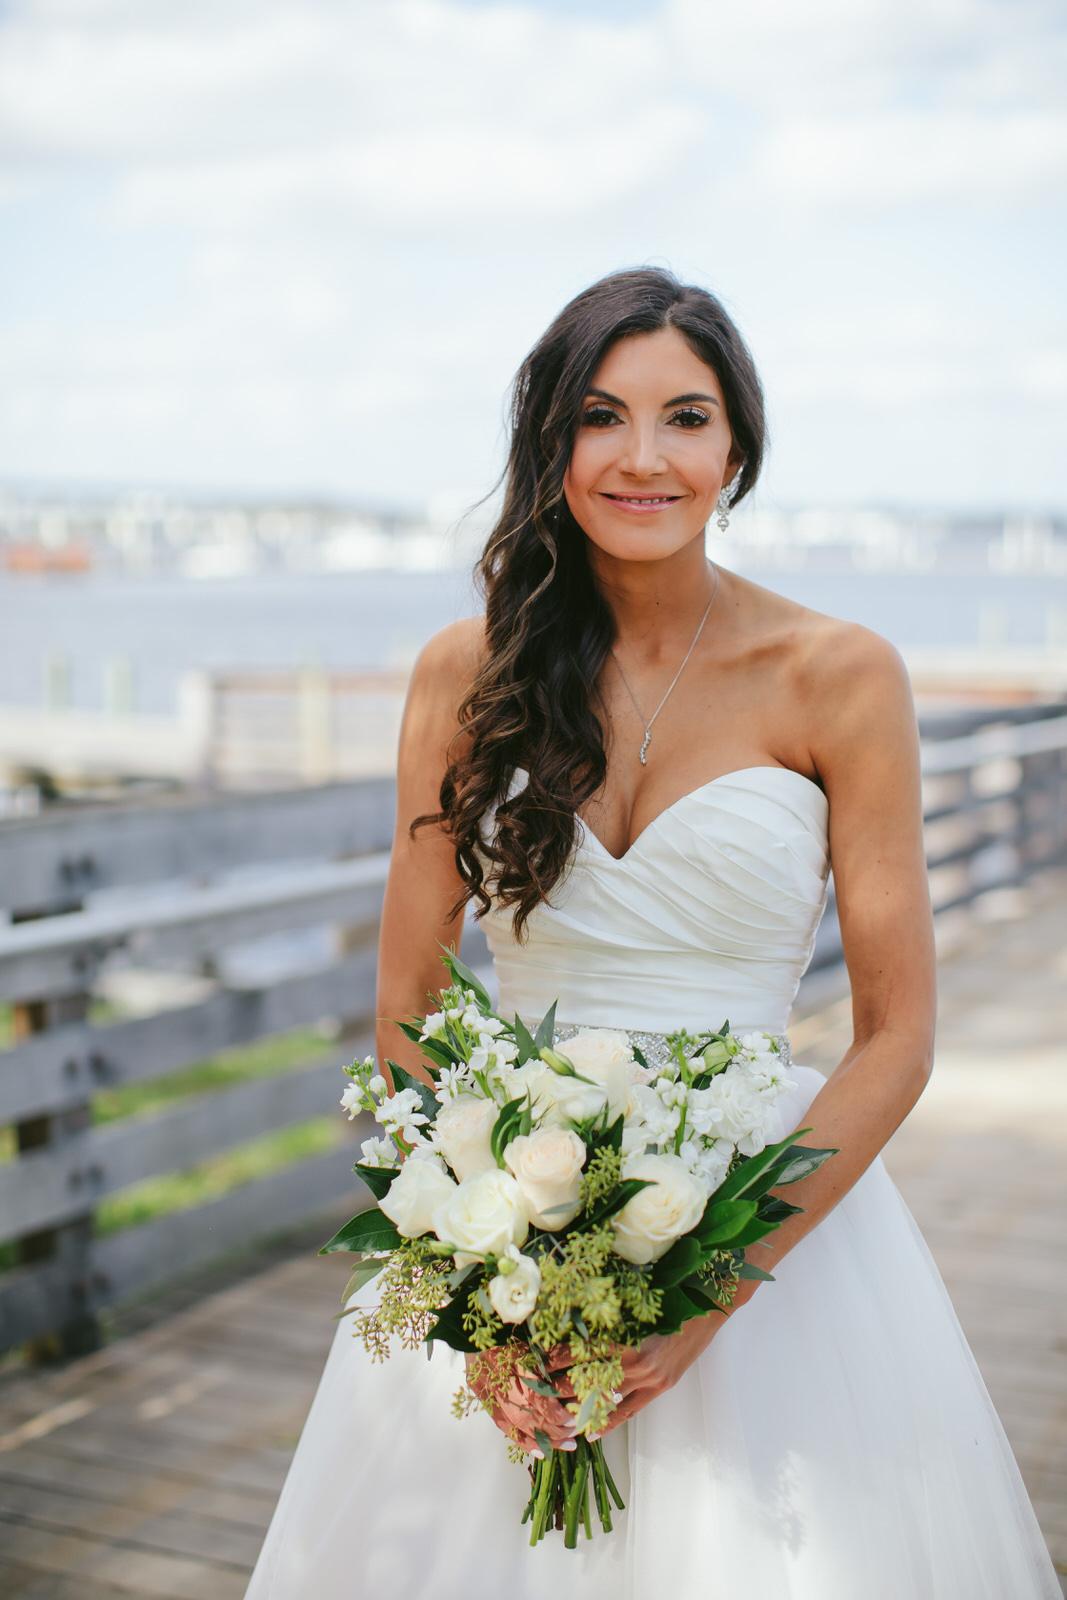 bride_and_groom_jensen_beach_wedding_day-11.jpg